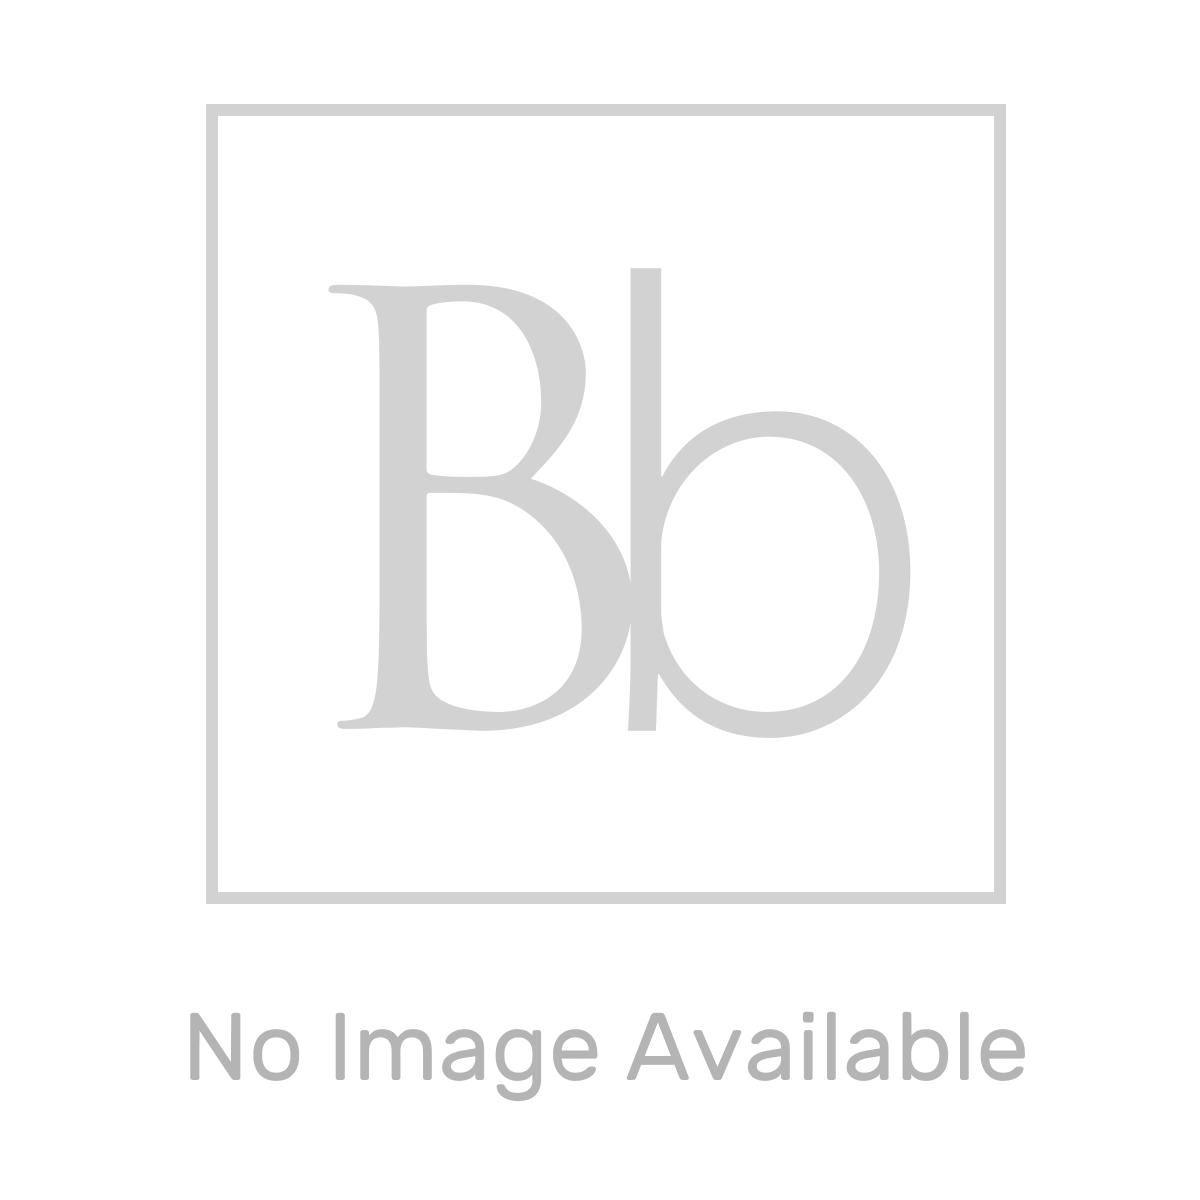 Nuie Athena Grey Avola 2 Drawer Floor Standing Vanity Unit with 18mm Profile Basin 600mm